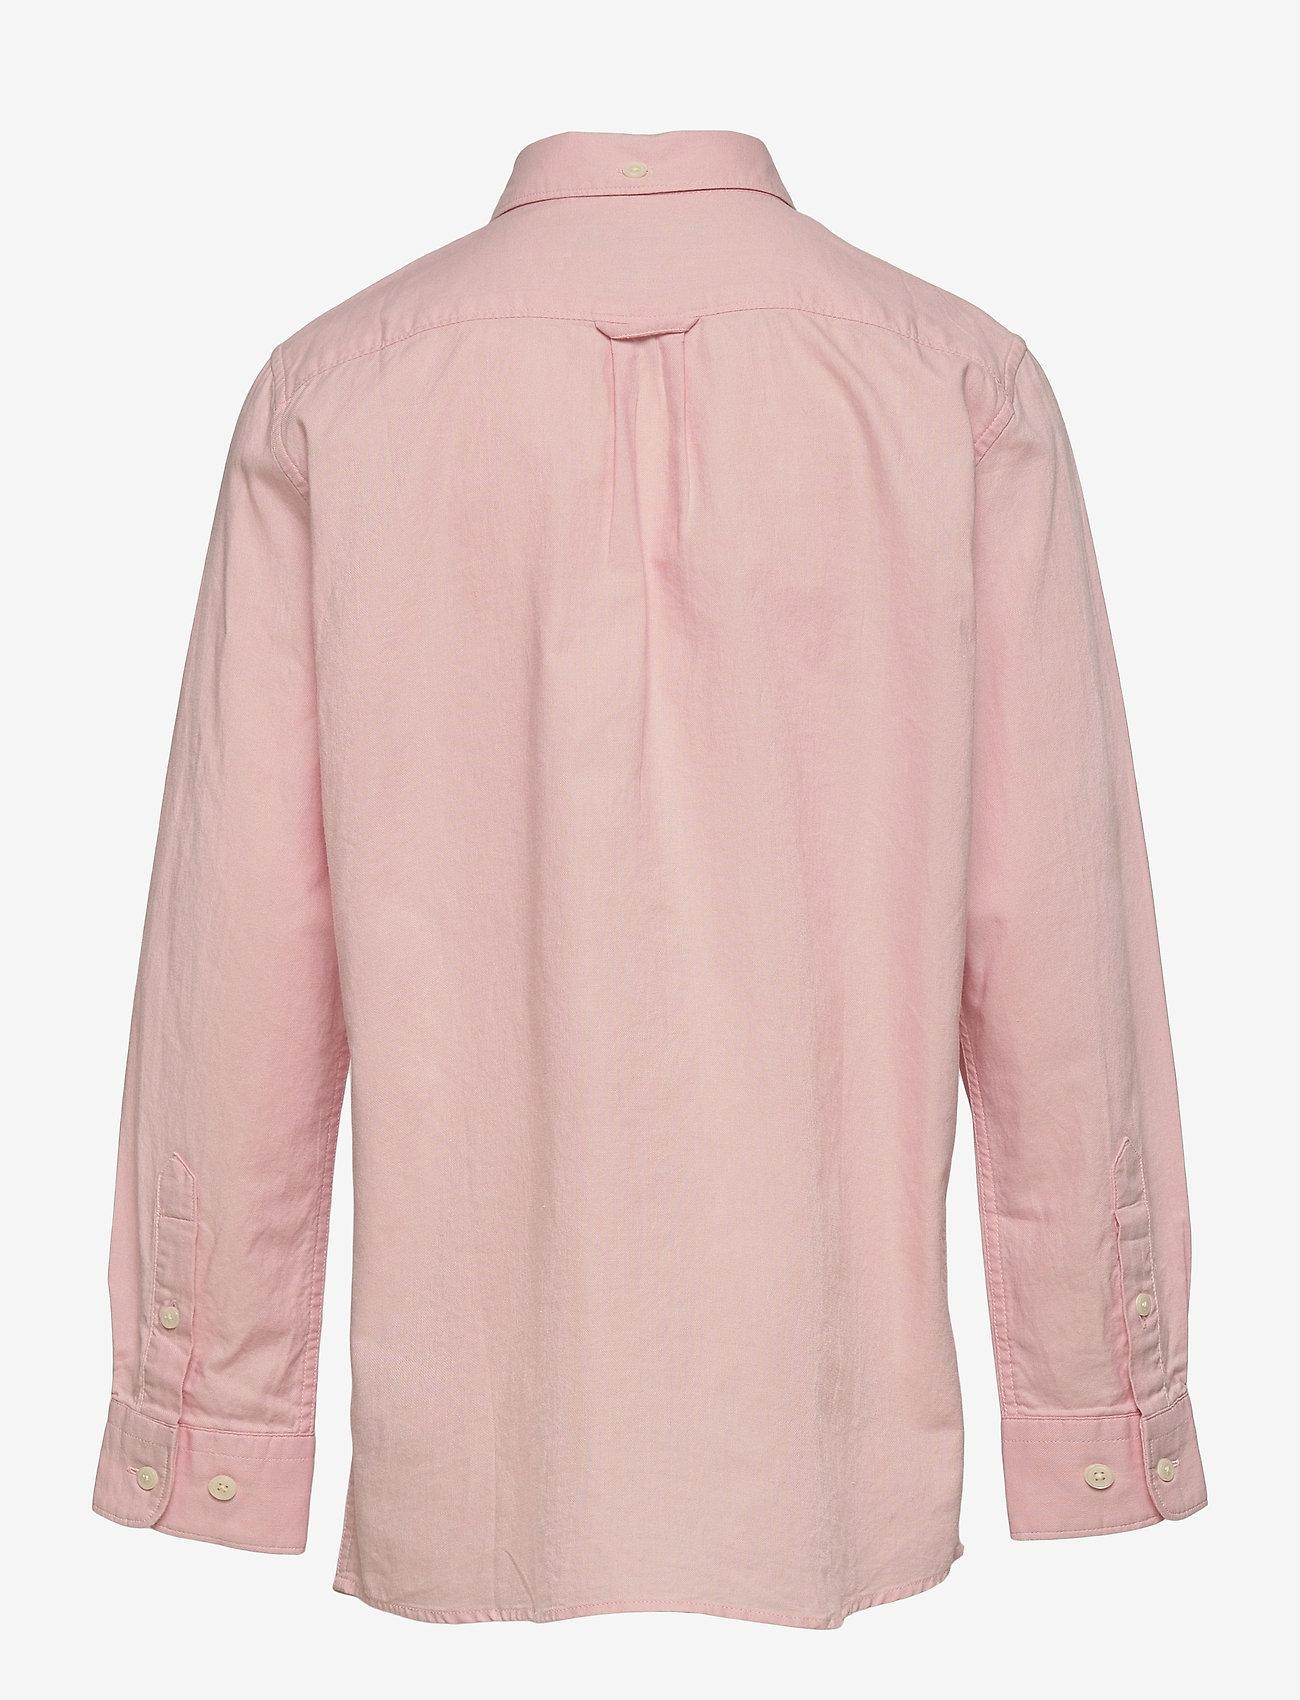 GANT - ARCHIVE OXFORD B.D SHIRT - shirts - quartz pink - 1